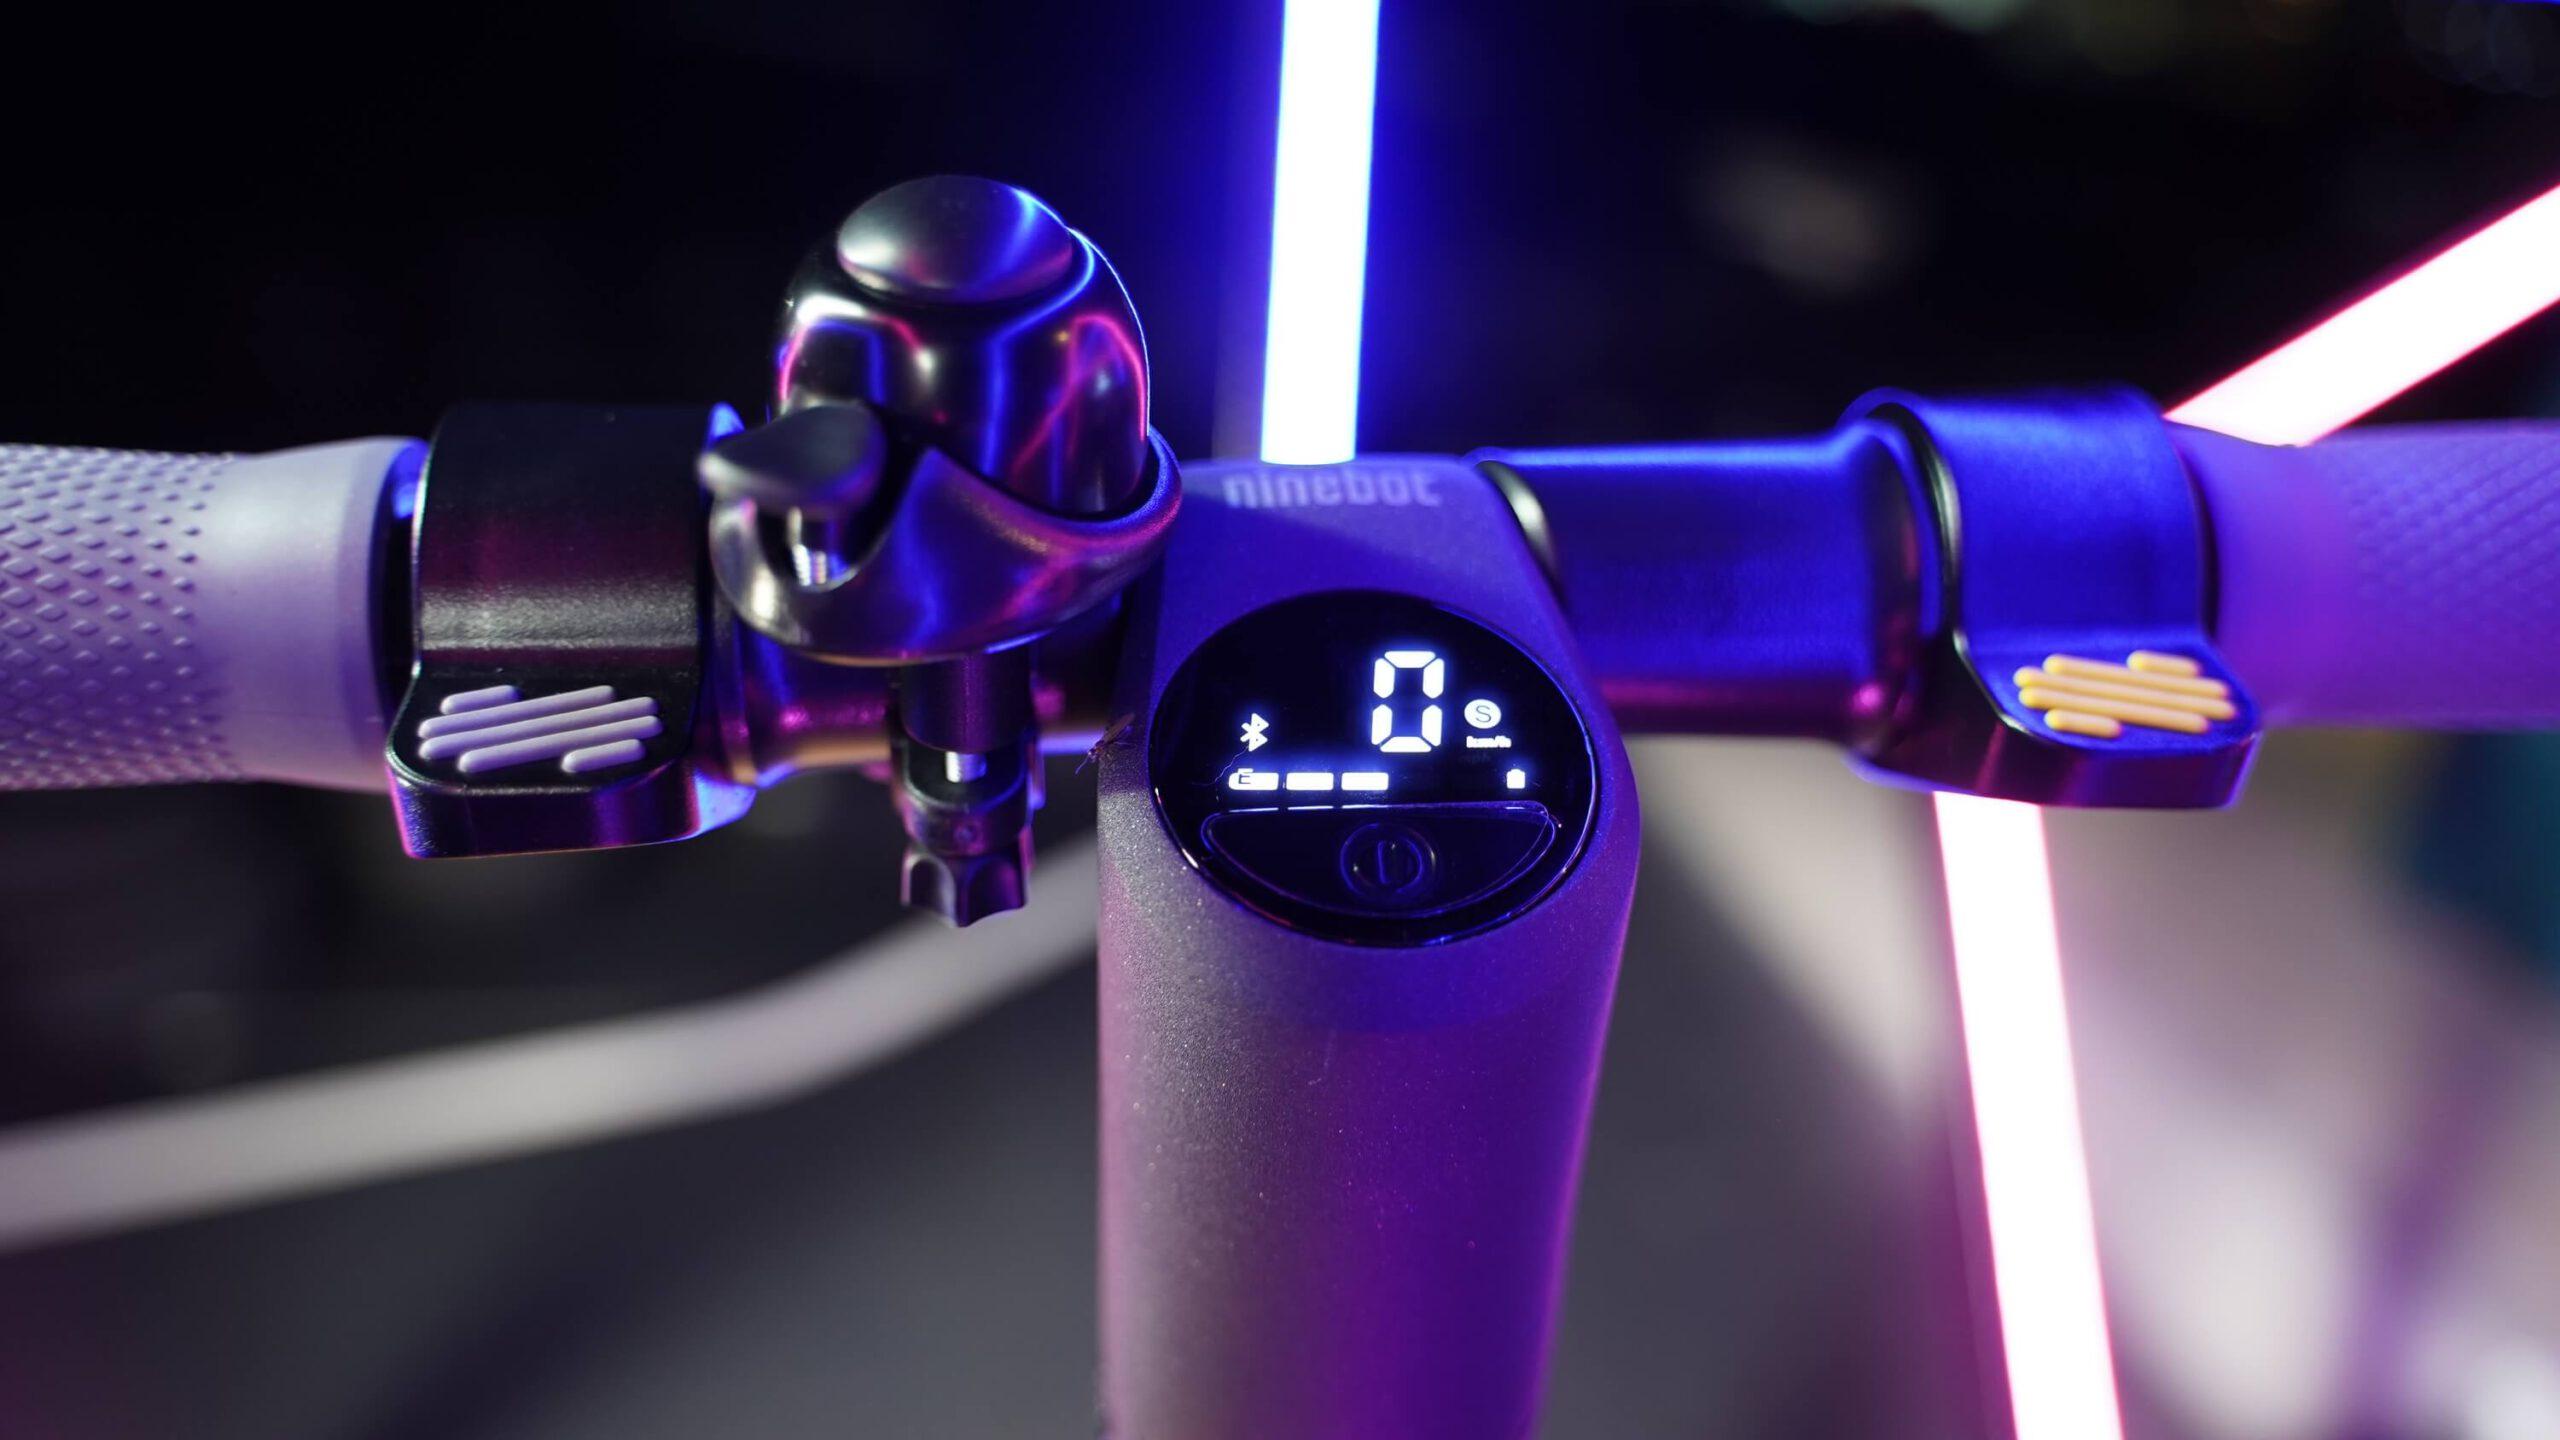 ninebot kickscooter e25-แผงควบคุม